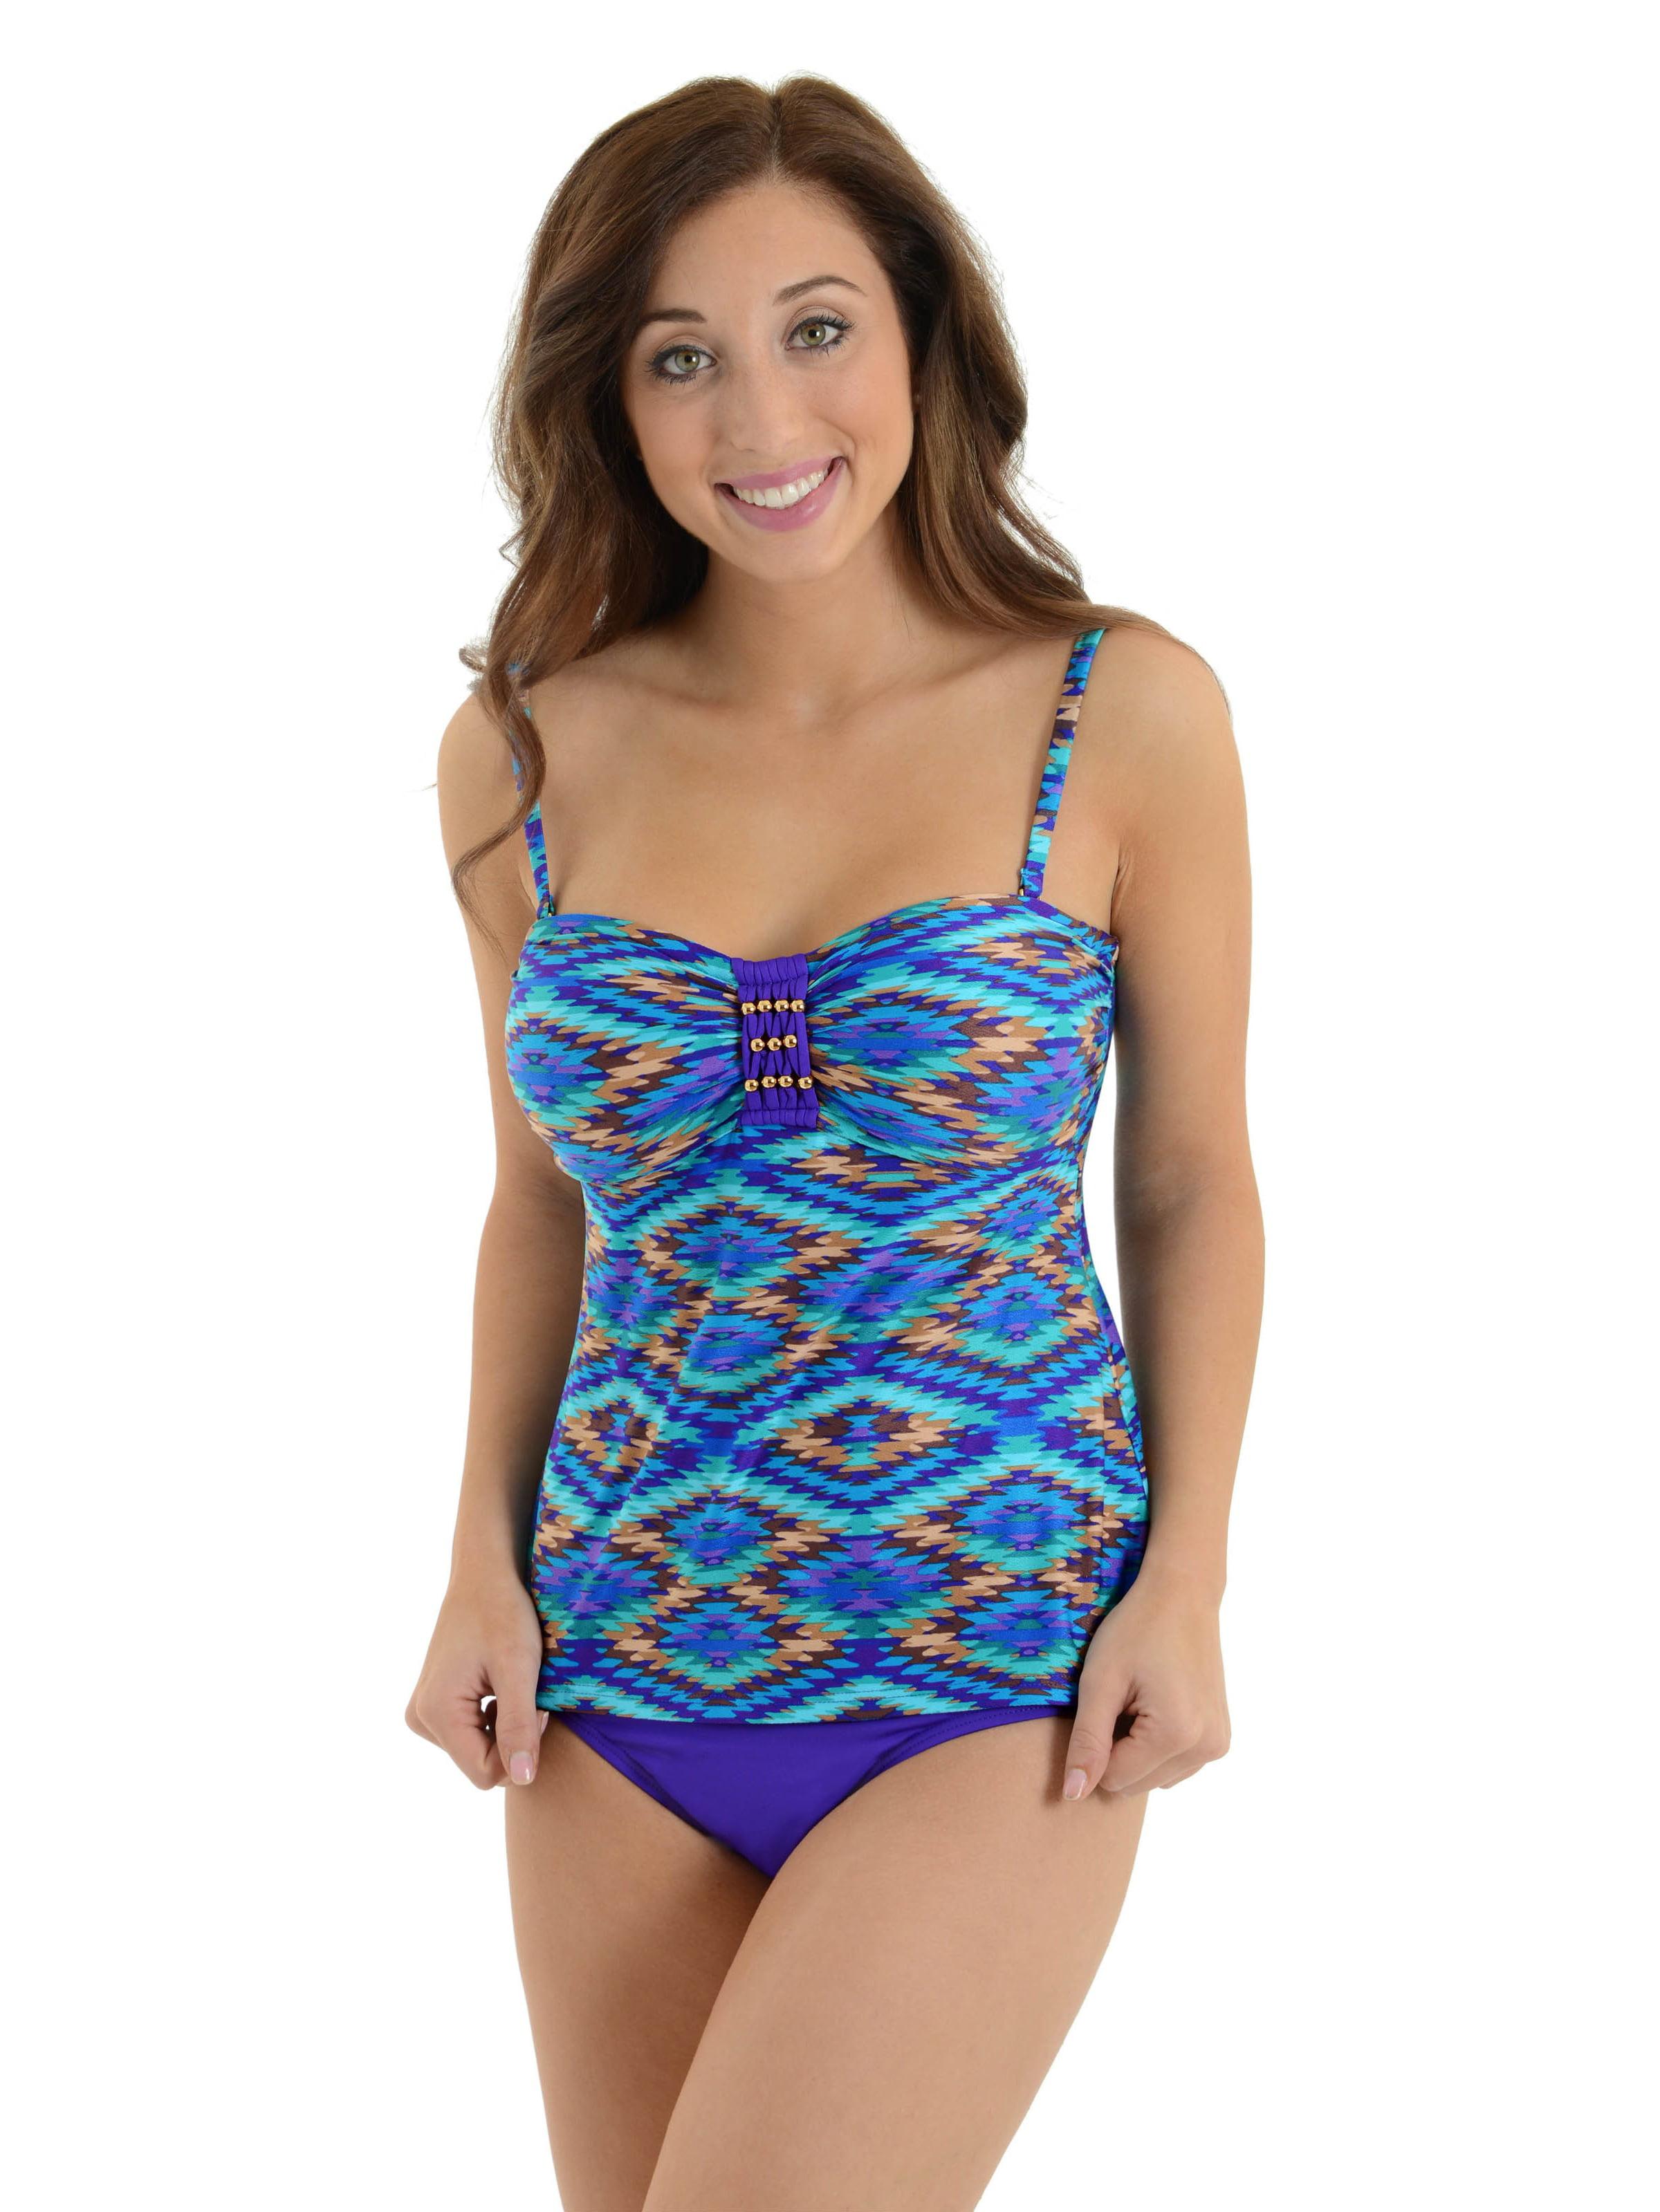 2bamboo Womens Bandeau Tankini Swimsuit 2 Piece Convertible Bathing